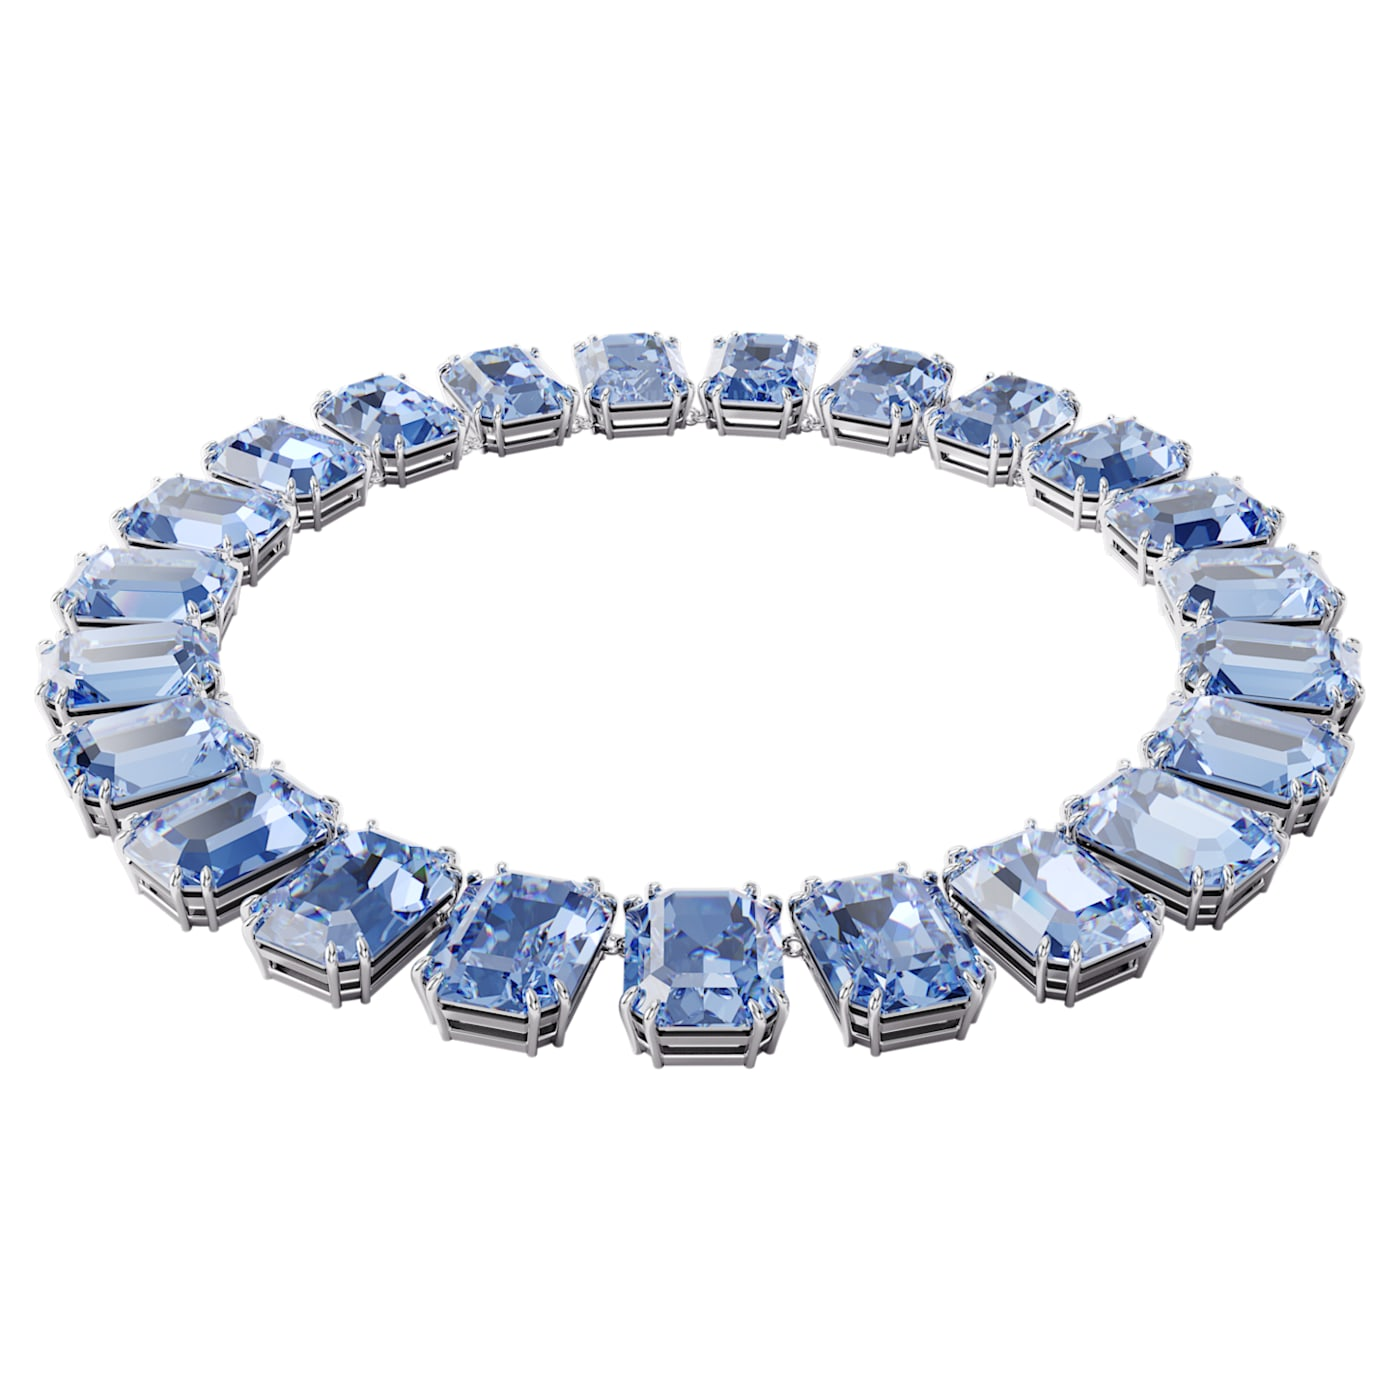 Collier Millenia Cristaux octogonaux, Bleu, Métal rhodié, Swarovski